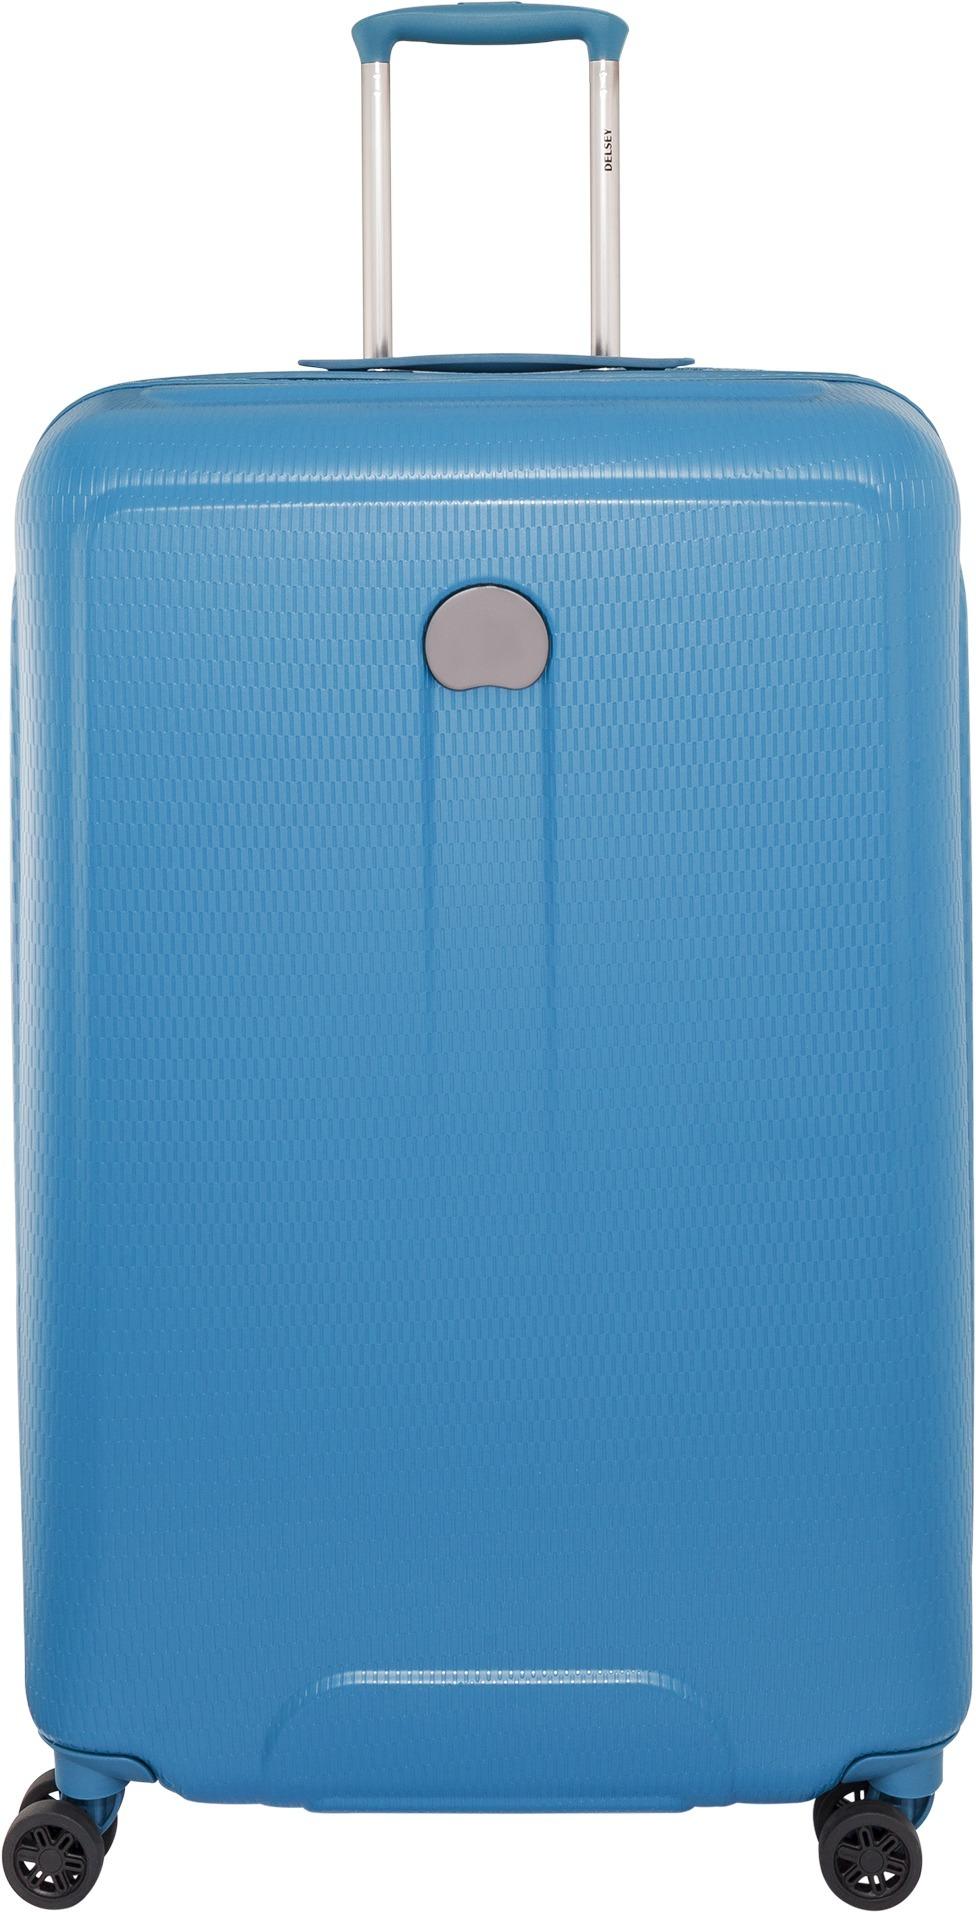 Чемодан Delsey Helium Air 2 Slim Cabin Trolley Case 76 см синий